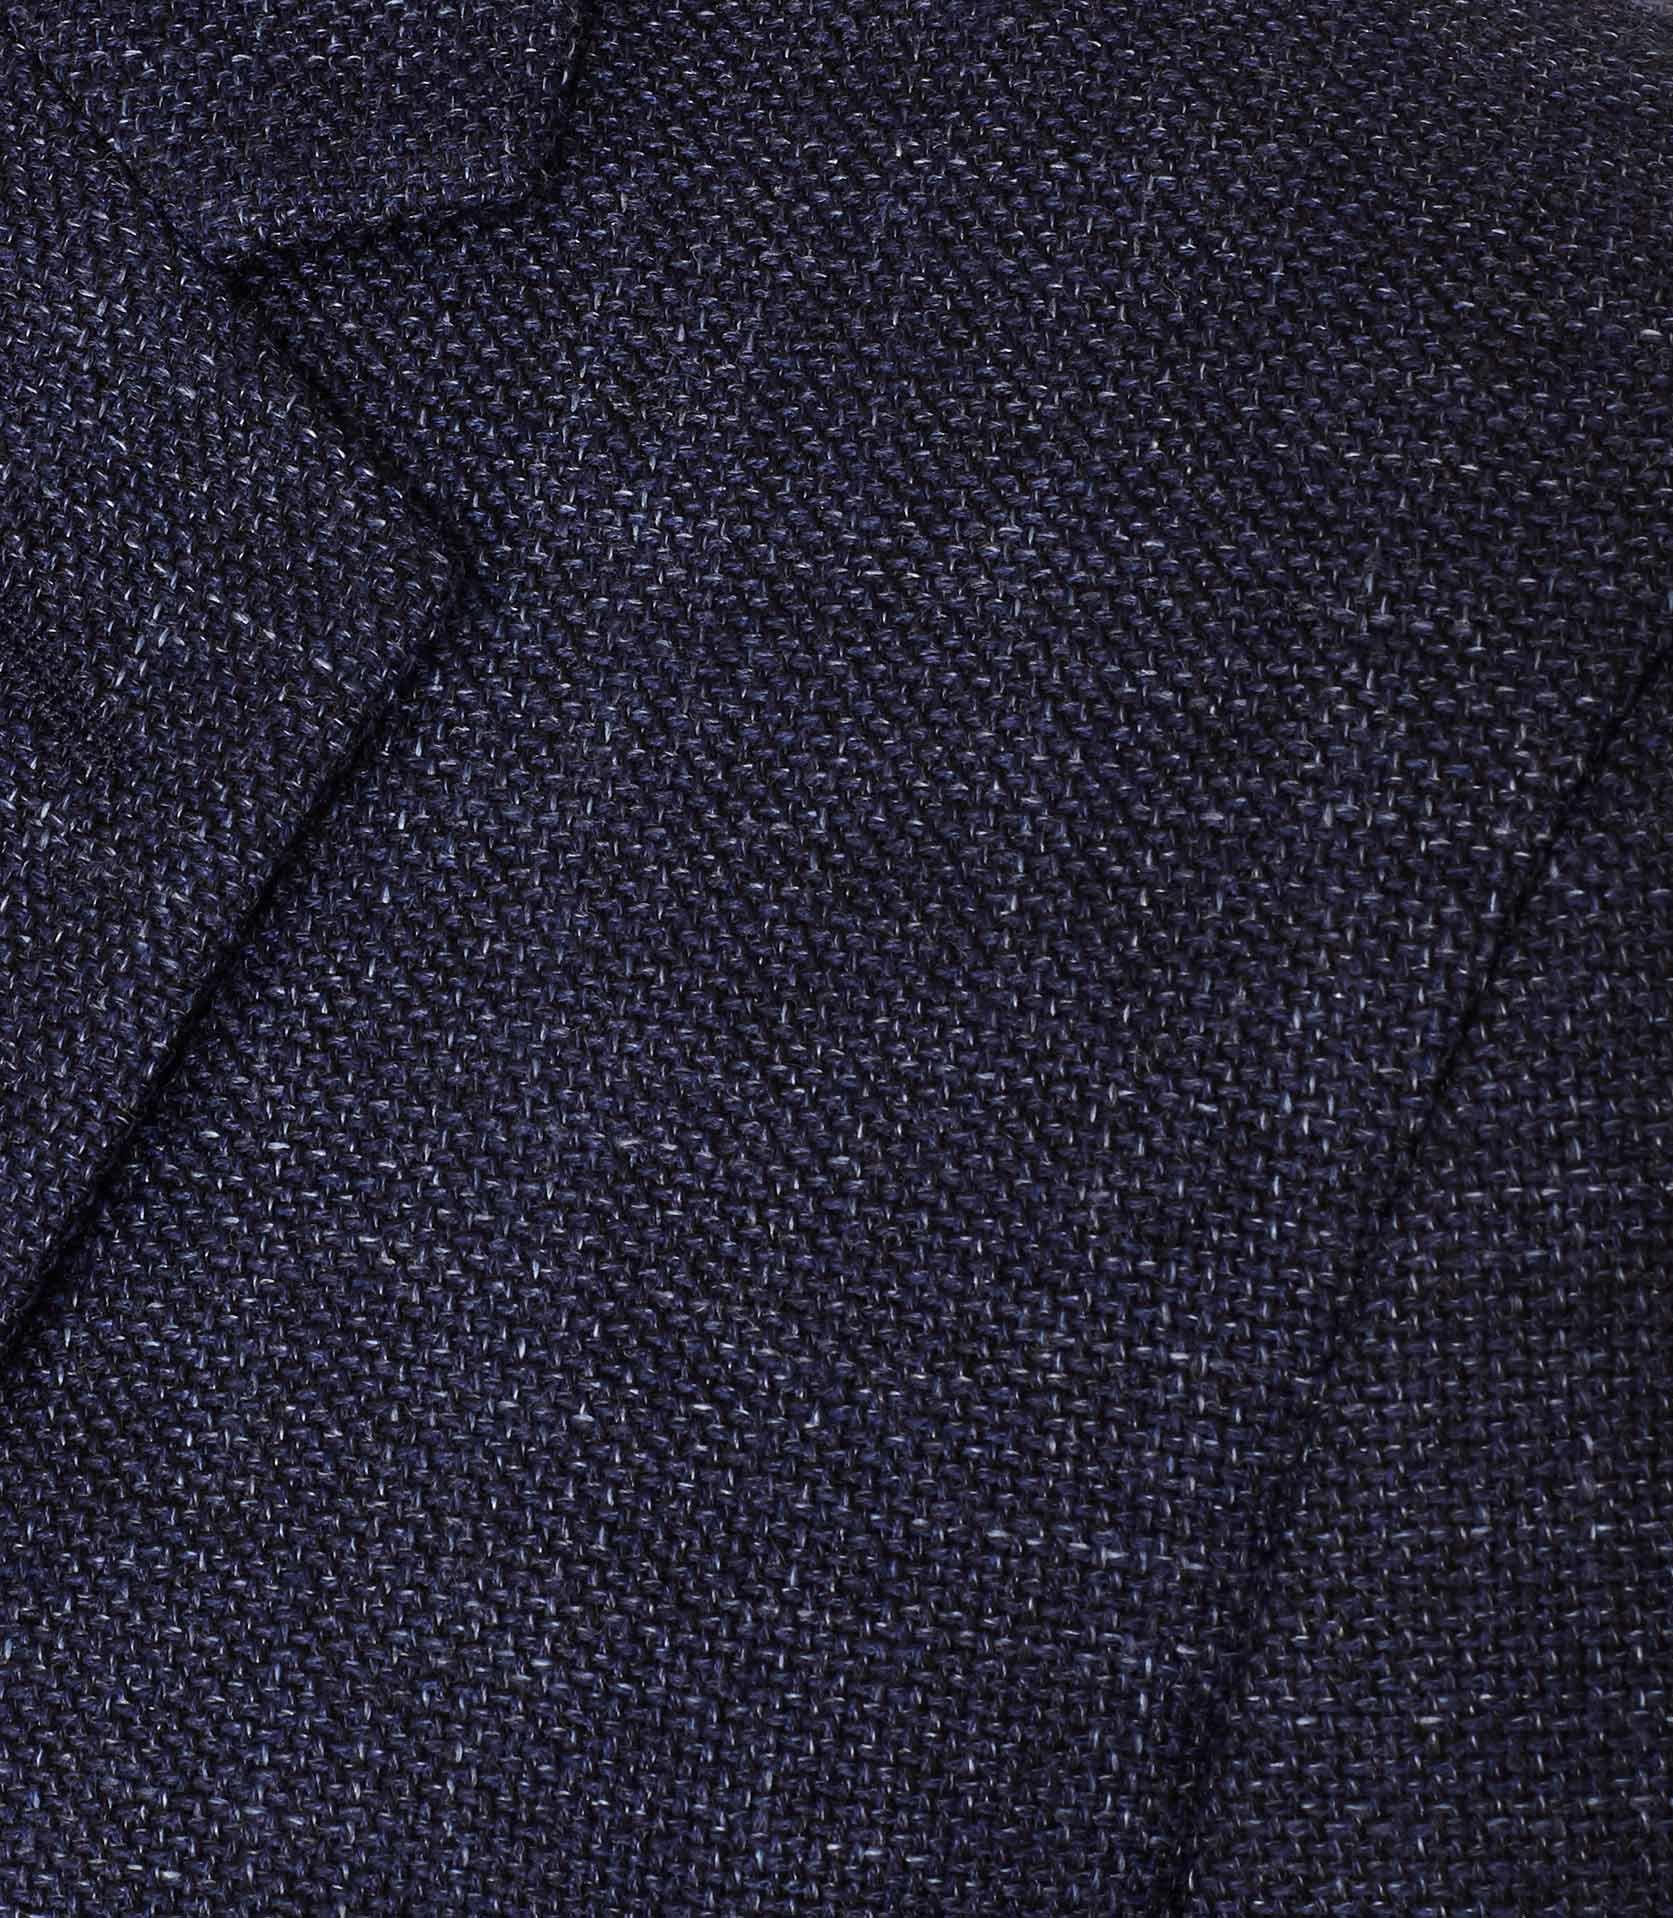 Reiss Cotton New Collection Eldo in Indigo (Blue) for Men